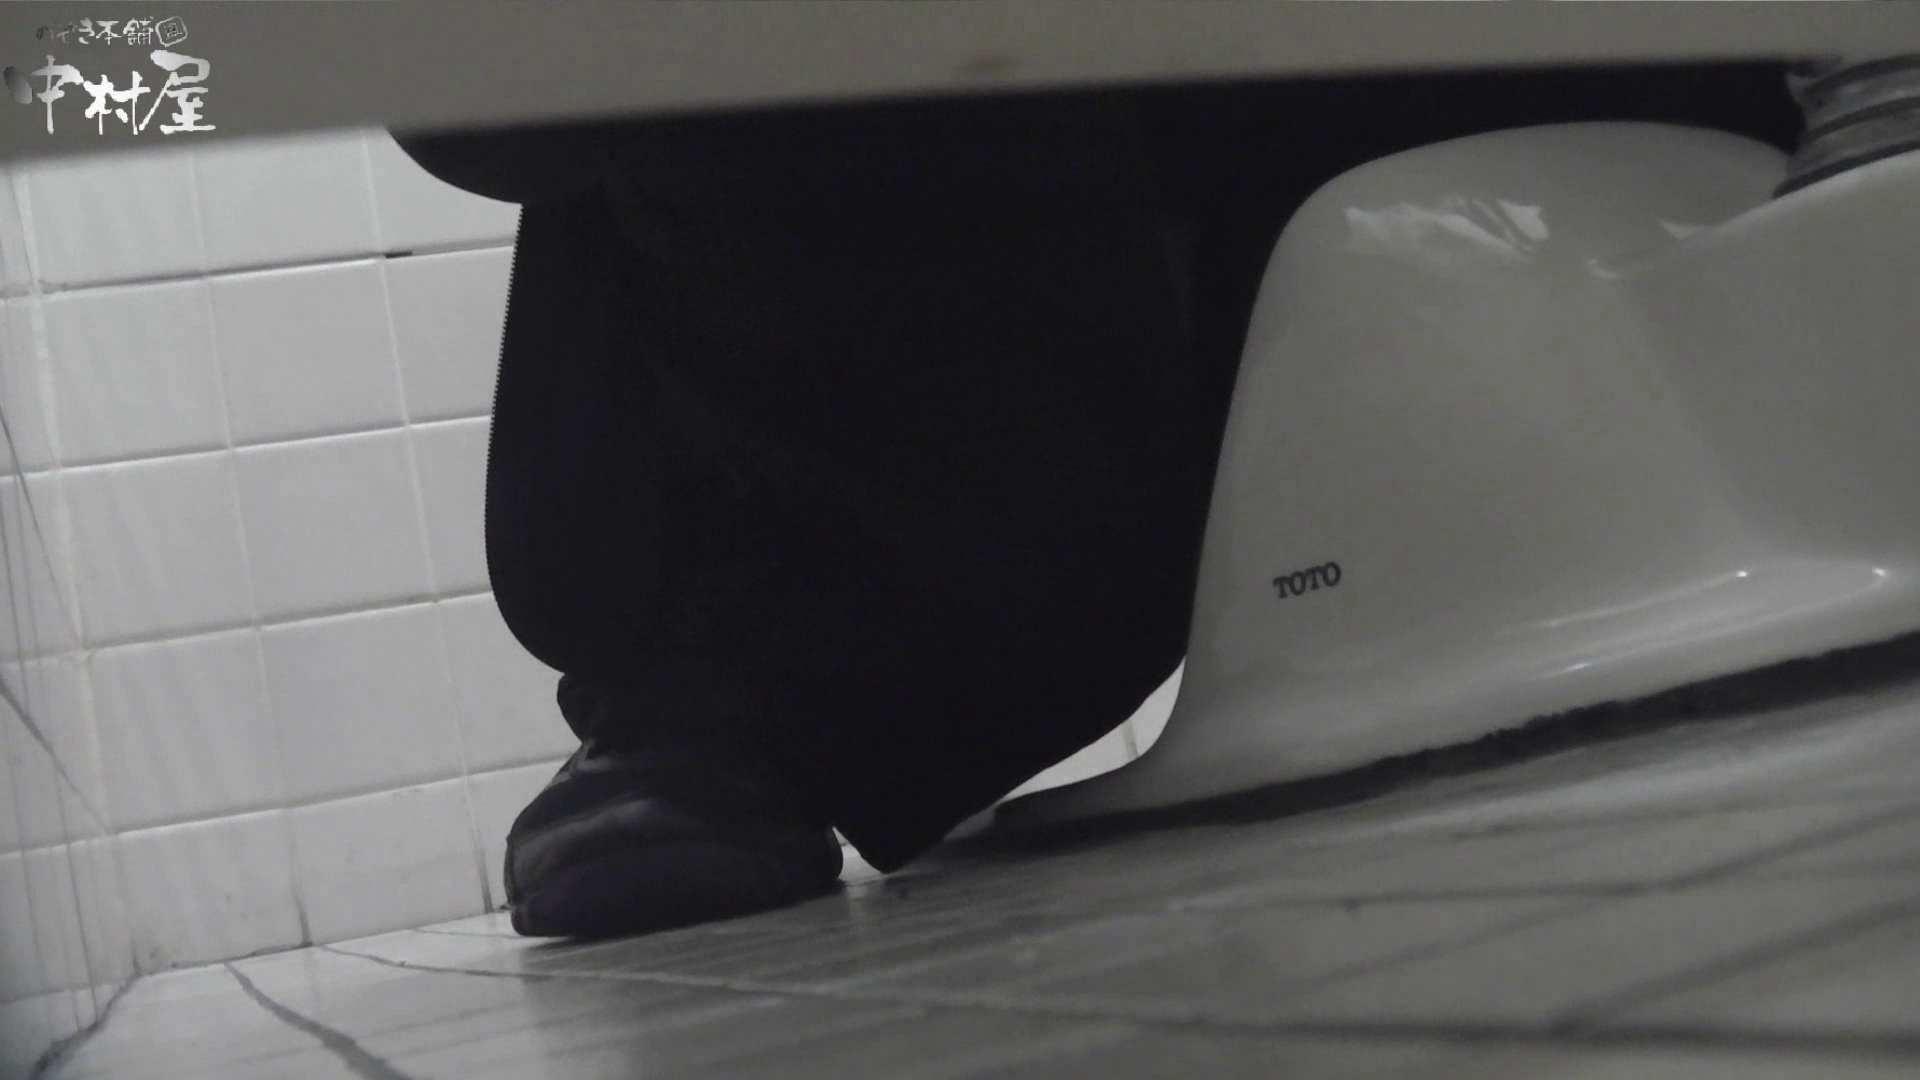 vol.51 命がけ潜伏洗面所! お嬢様チック・硬度並・推定80g 洗面所 盗み撮りAV無料動画キャプチャ 93PICs 3